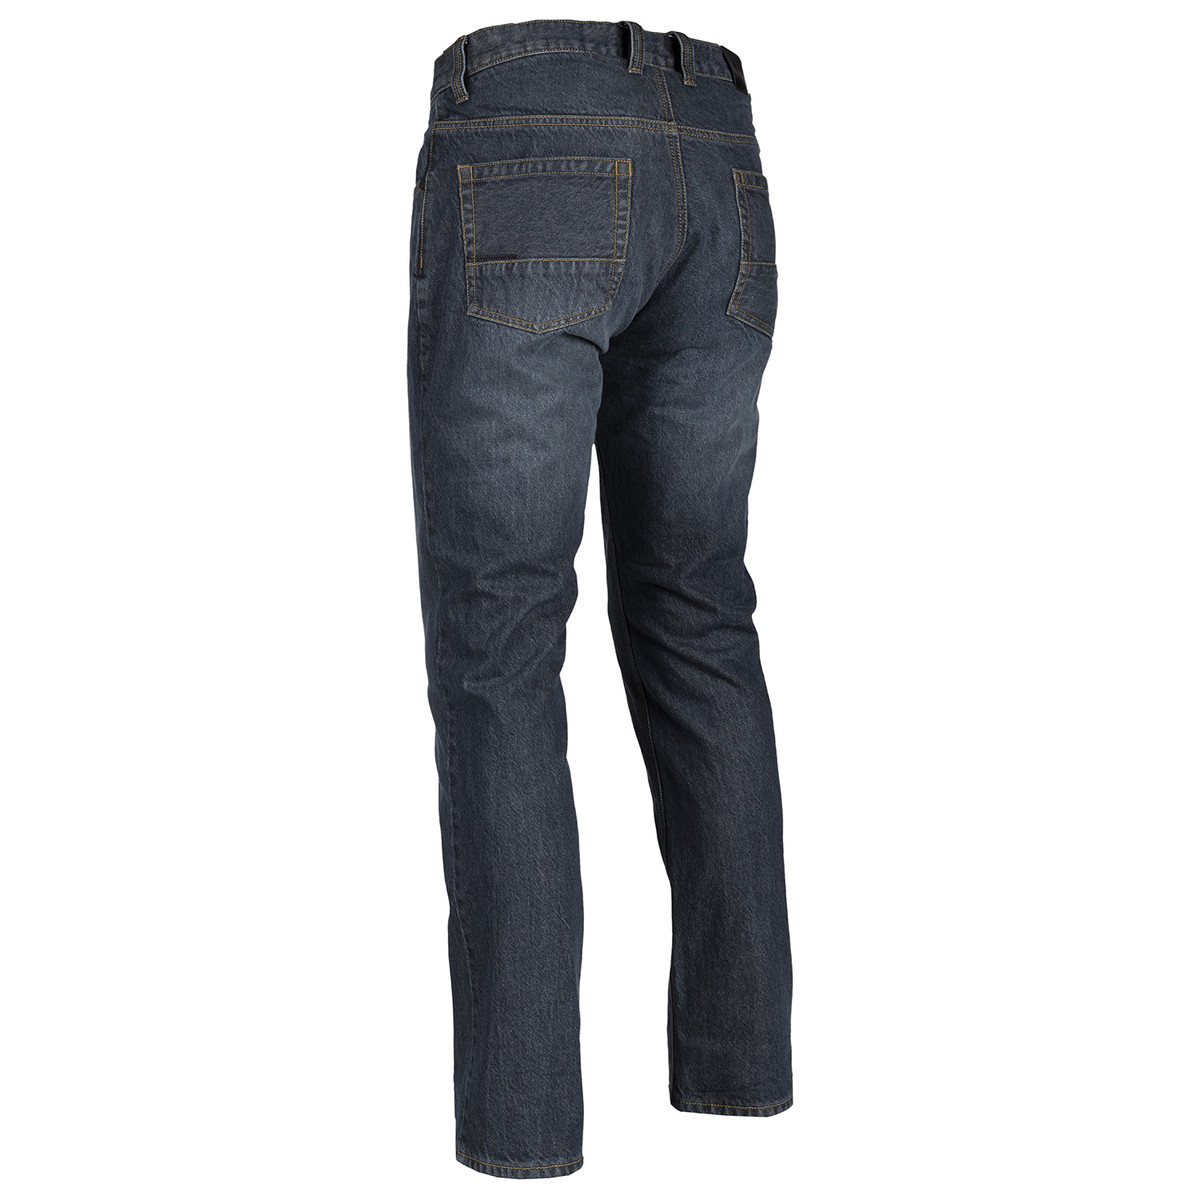 K Fifty 2 Denim - Dark Blue Back